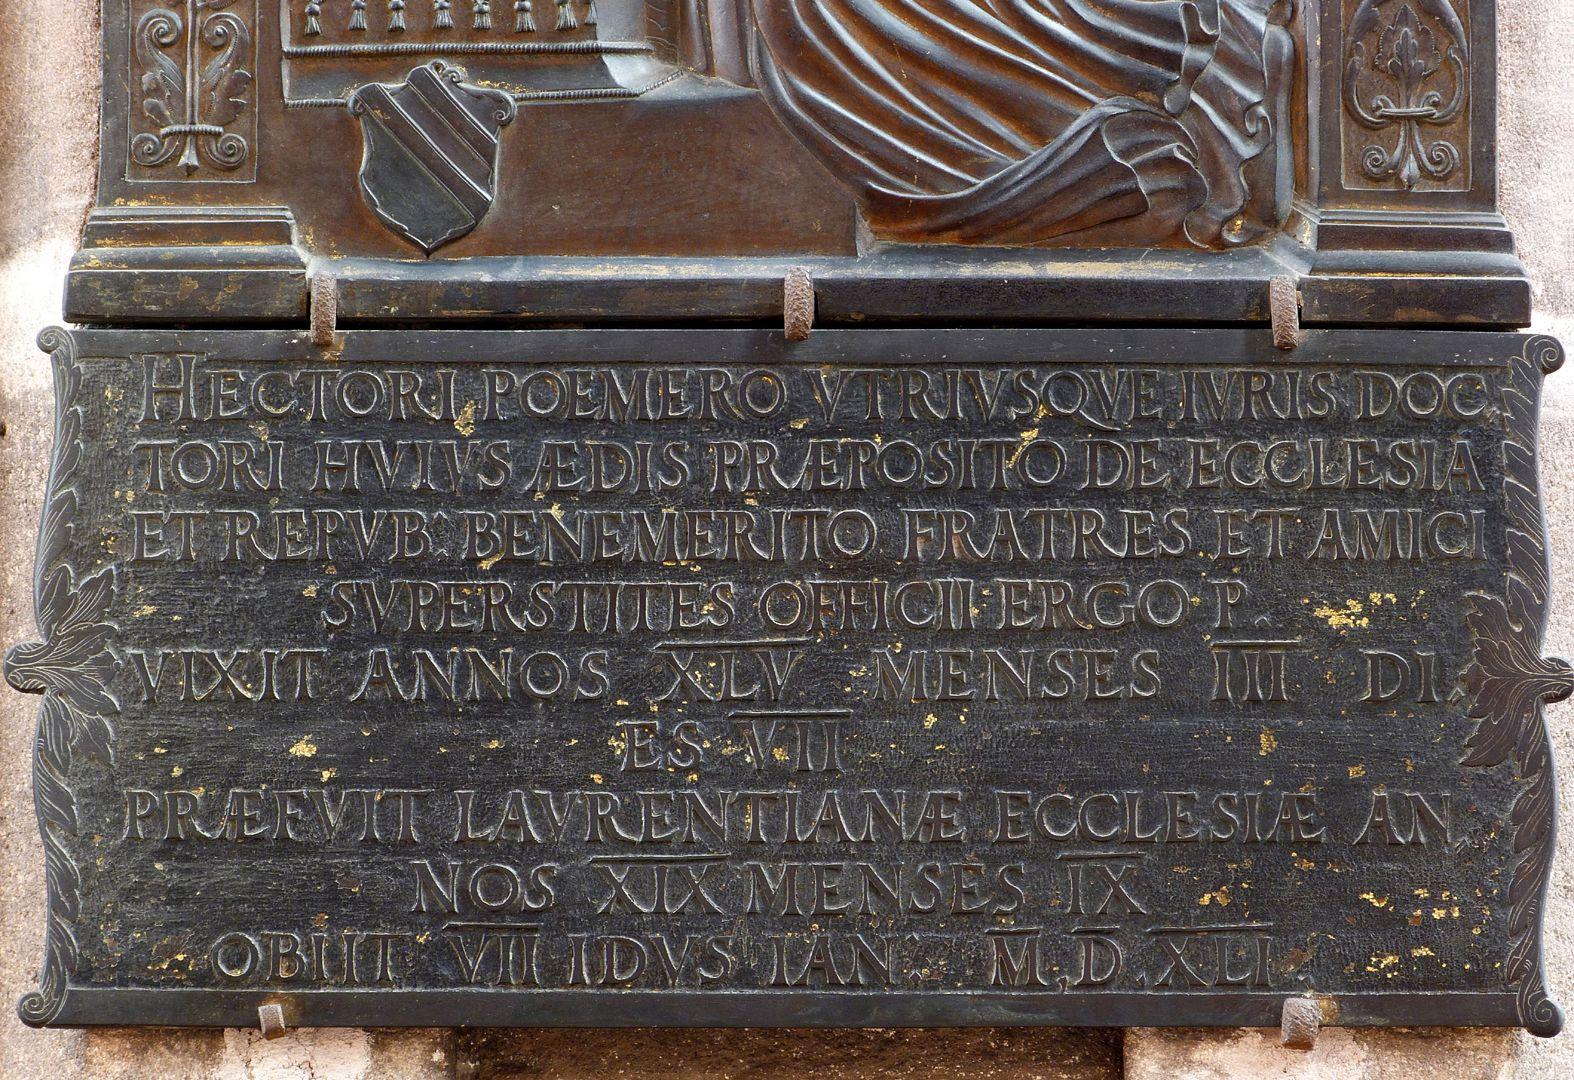 Epitaph für Dr. Hector Pömer d.J. Inschrift